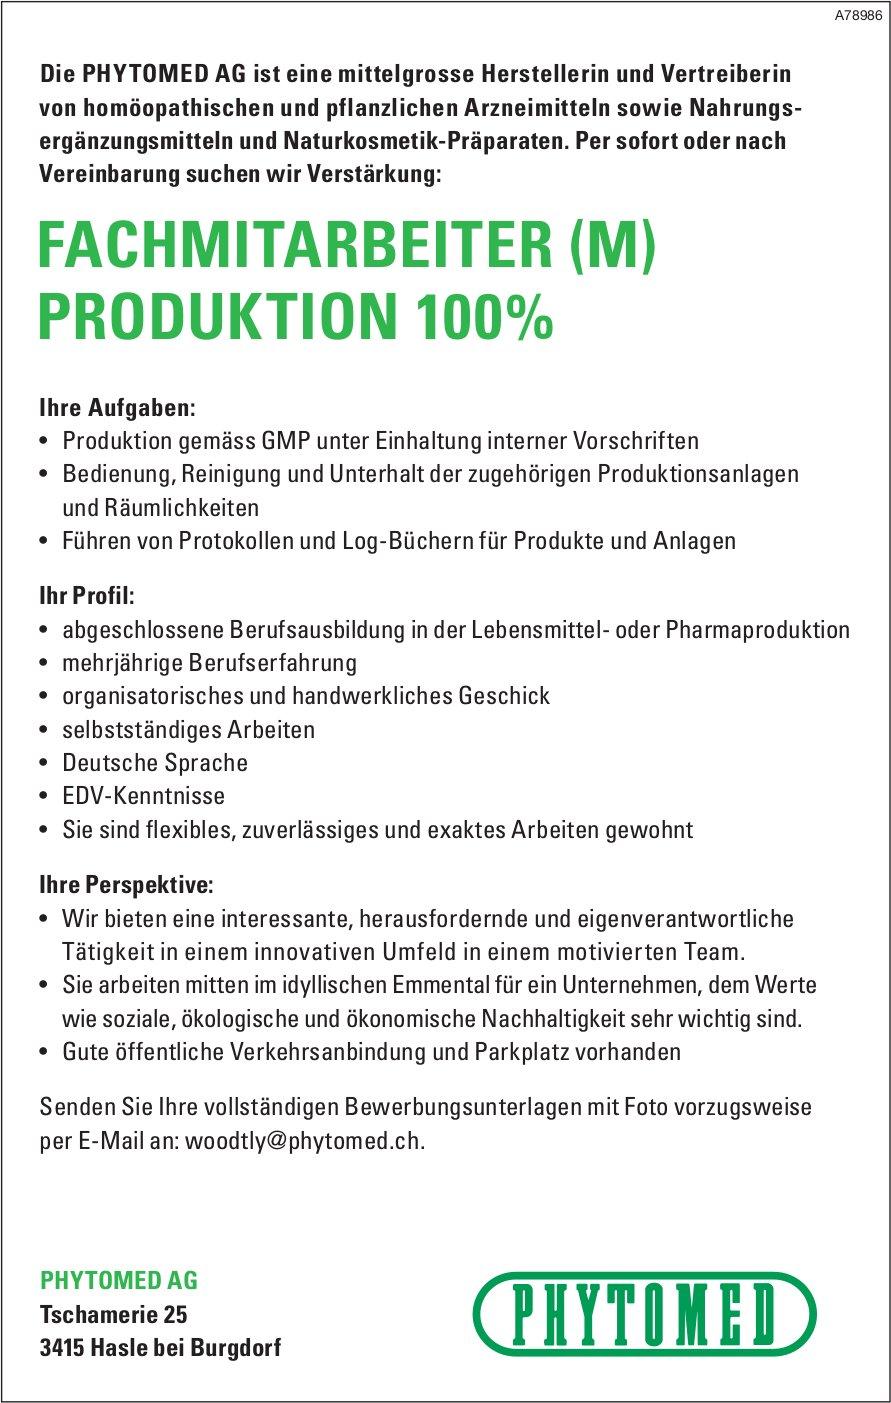 FACHMITARBEITER (M) PRODUKTION 100%, PHYTOMED AG, Hasle bei Burgdorf, gesucht